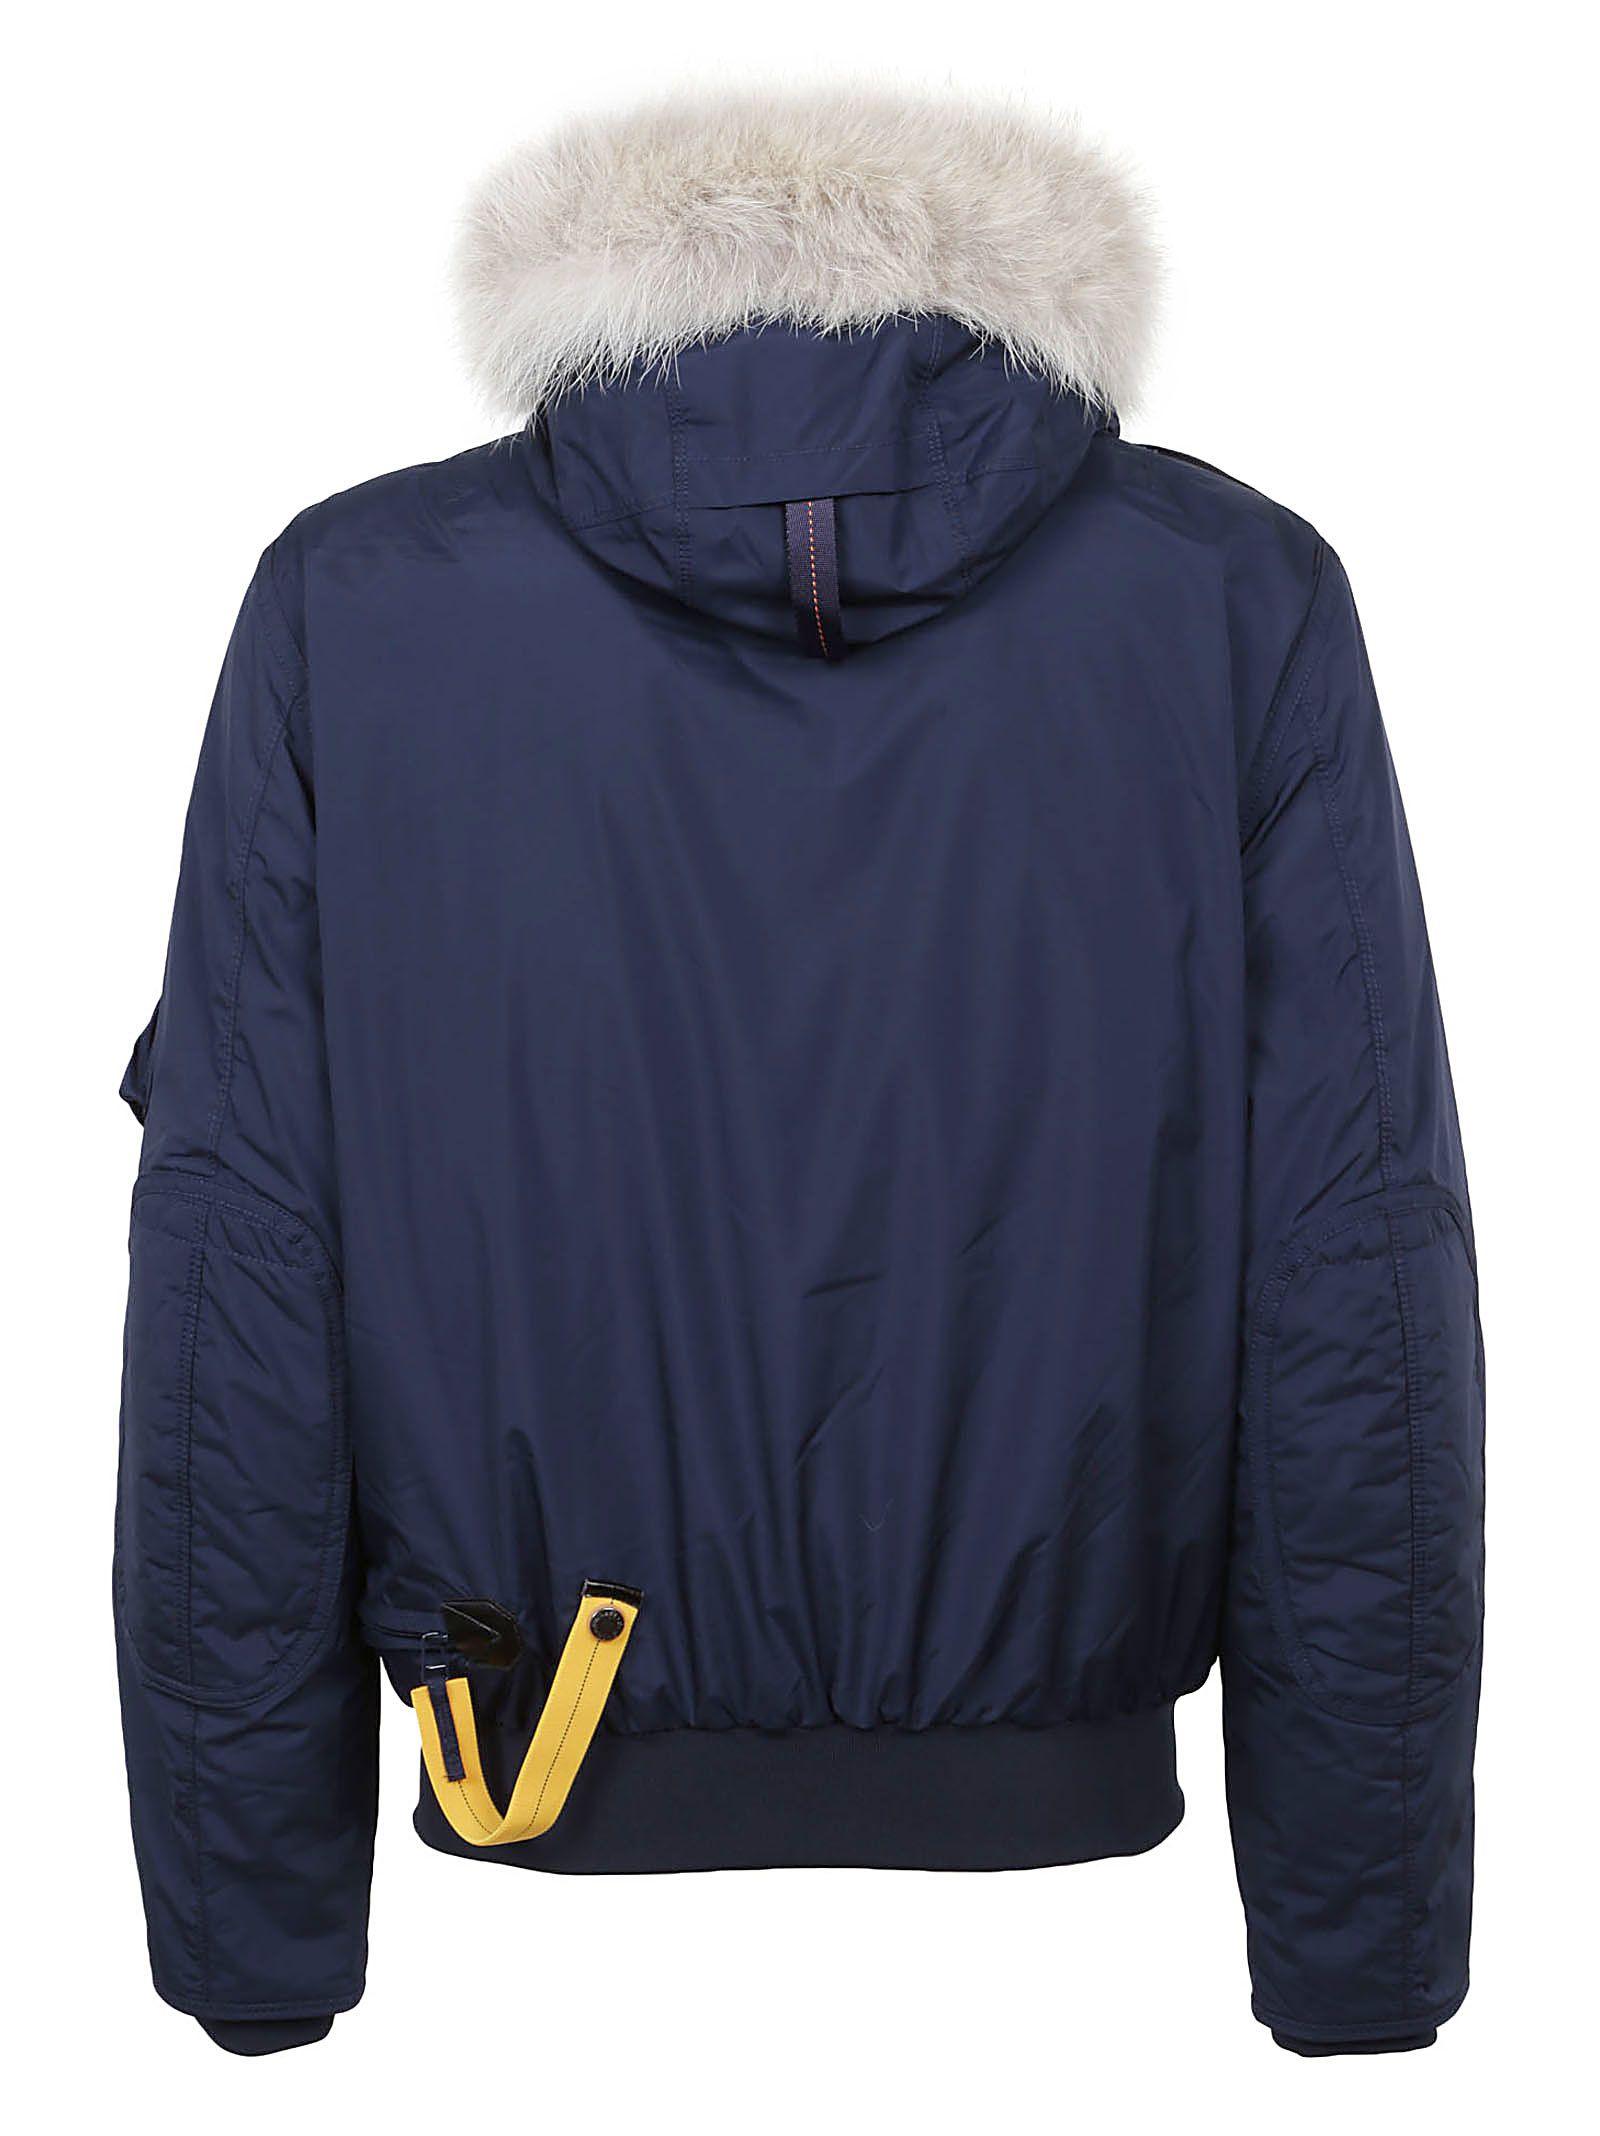 ... Parajumpers Gobi Light Man Jacket - Cadet Blue